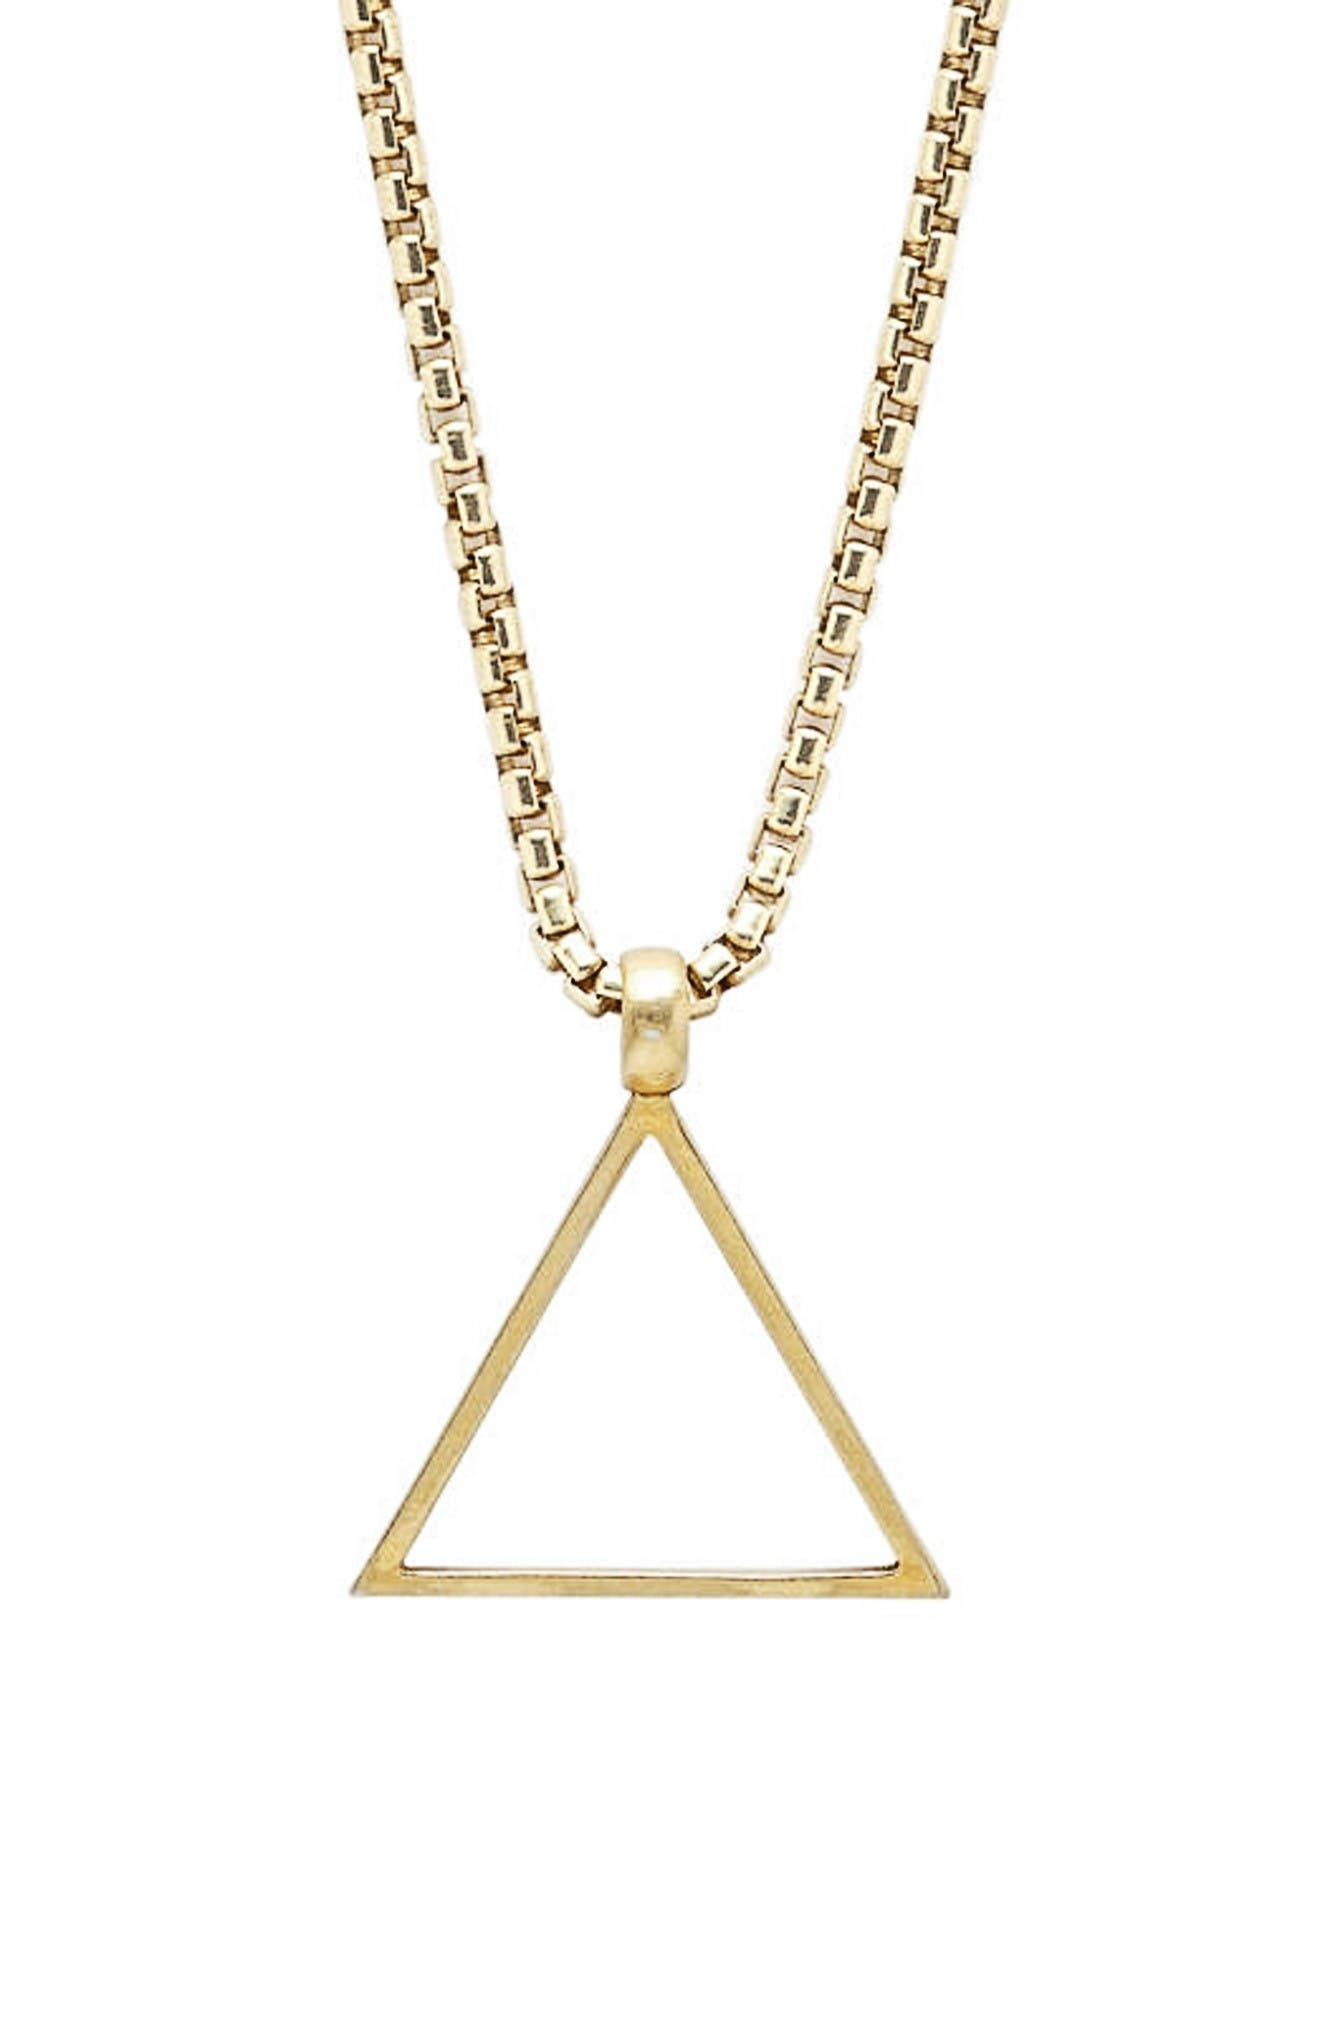 DEGS & SAL Triangle Pendant Necklace